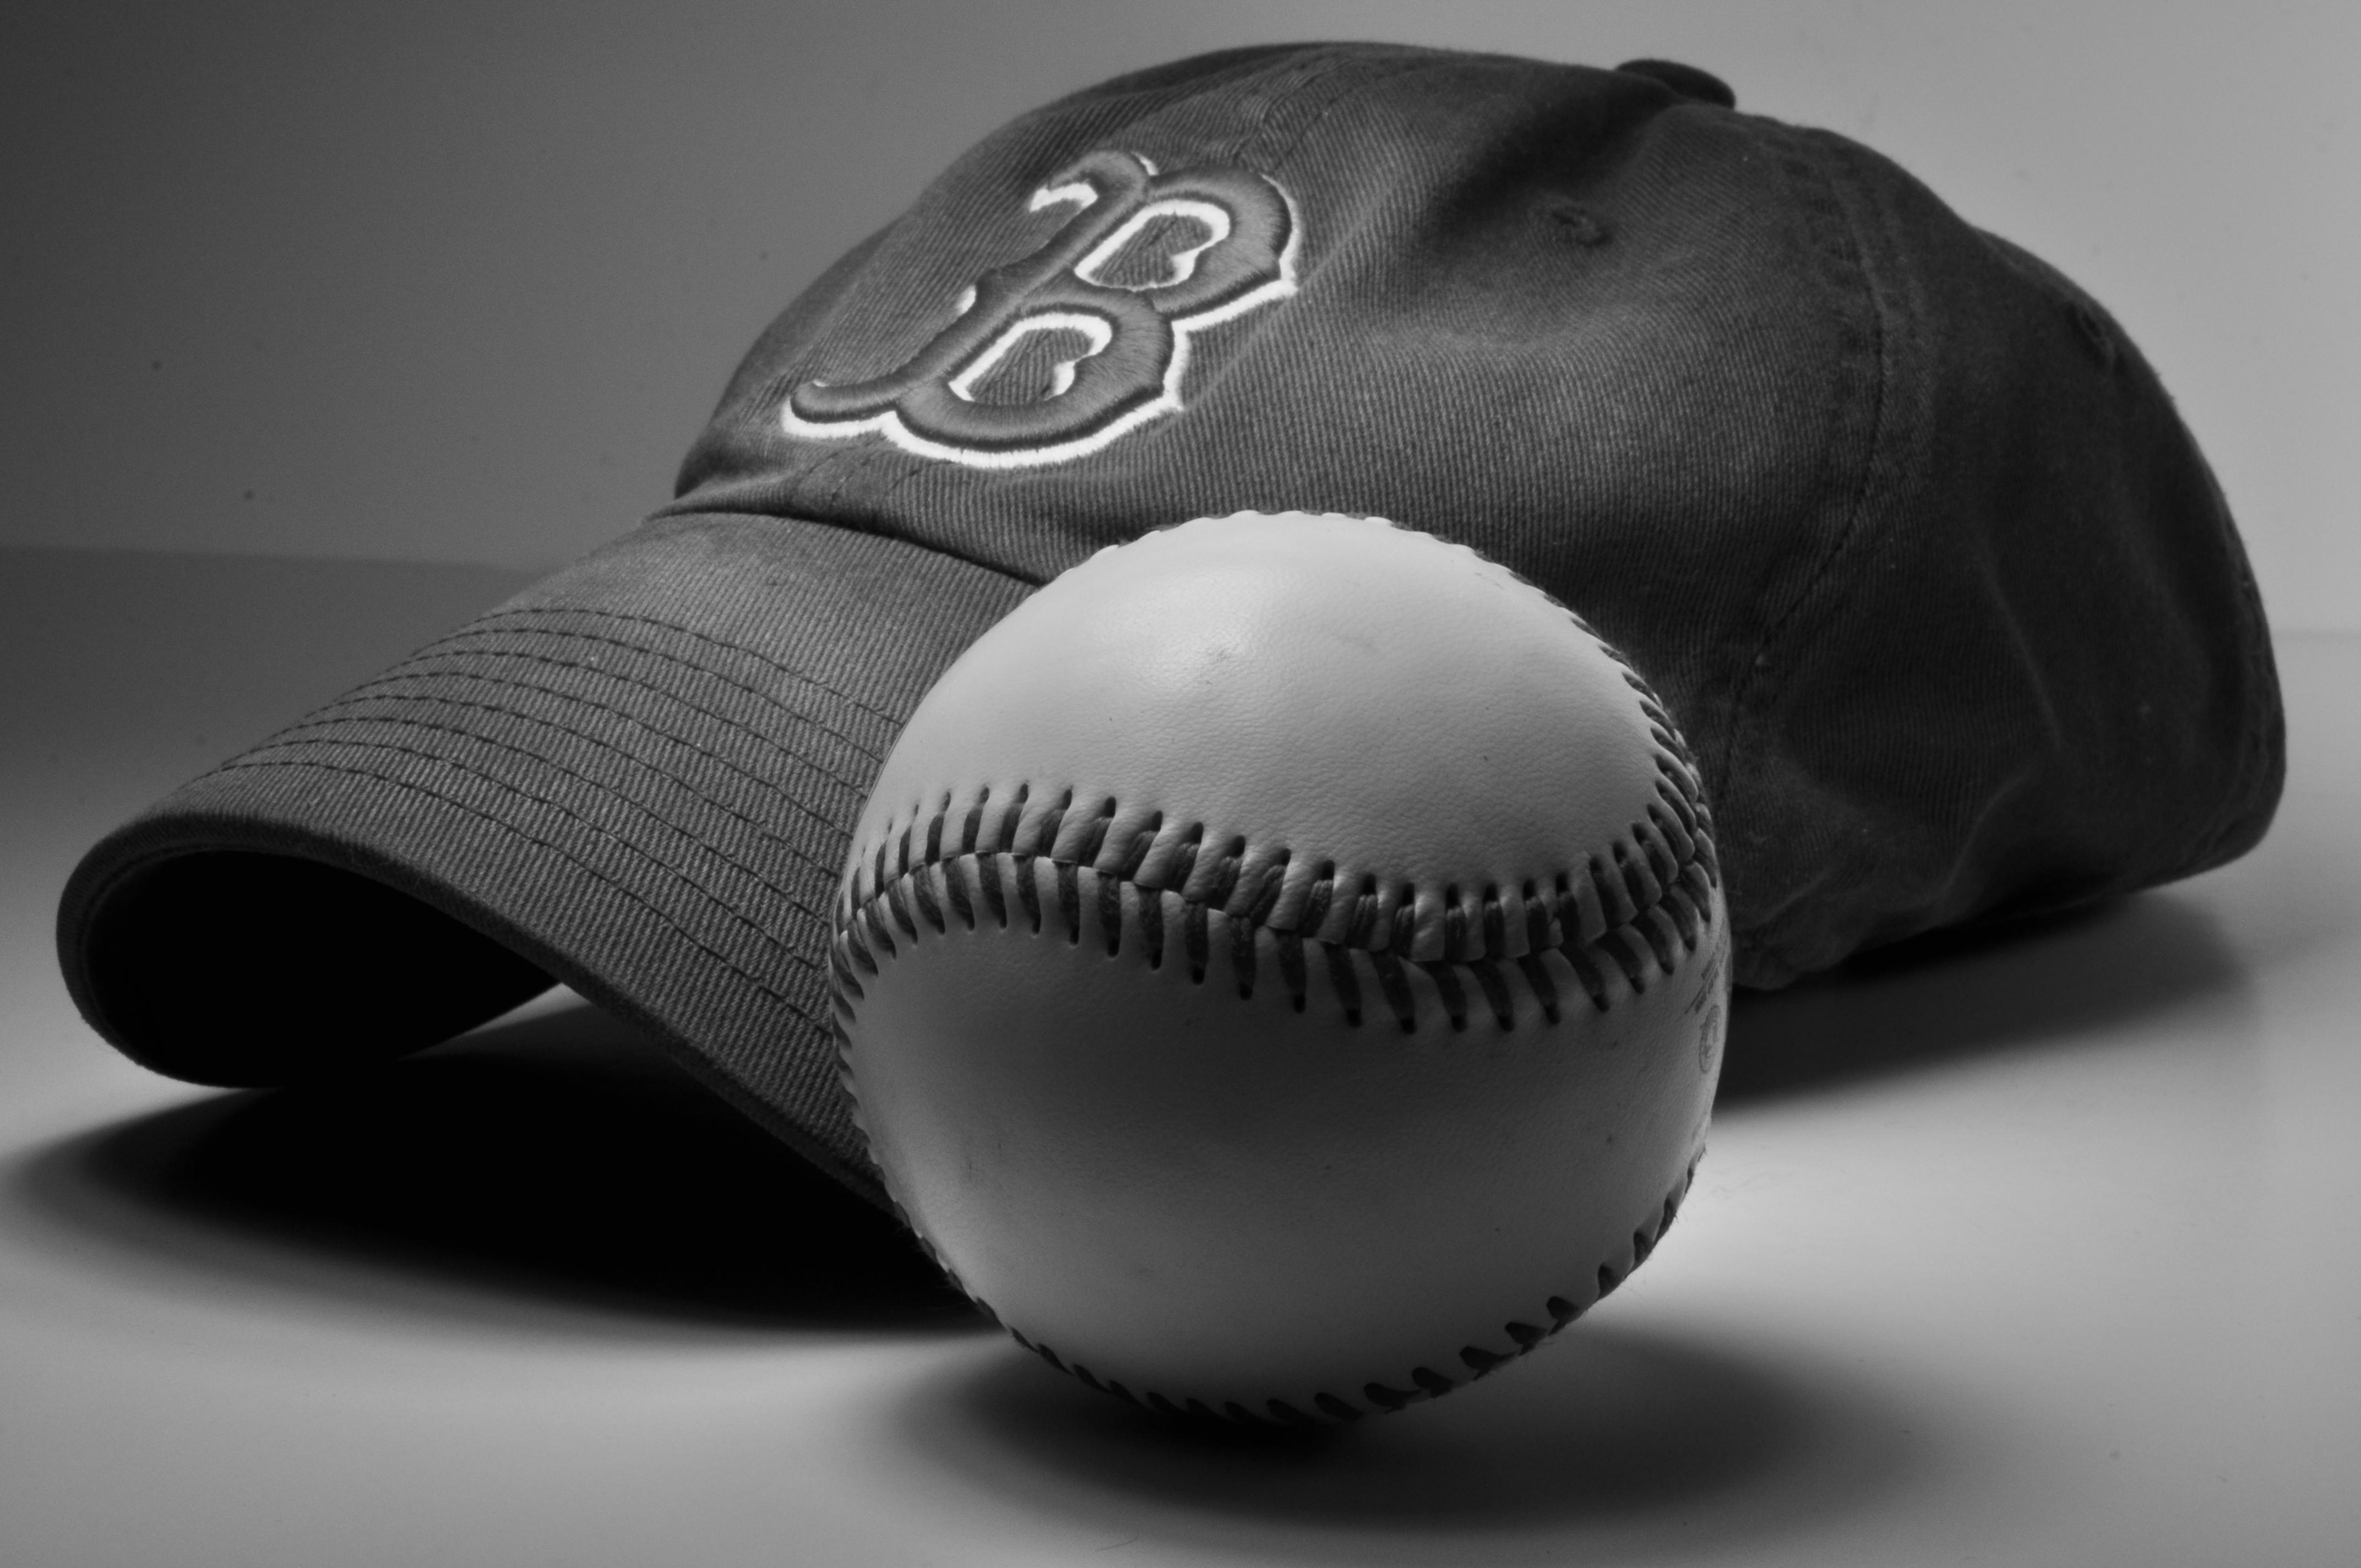 Boston Red Sox 4k Ultra HD Wallpaper Background Image 4288x2848